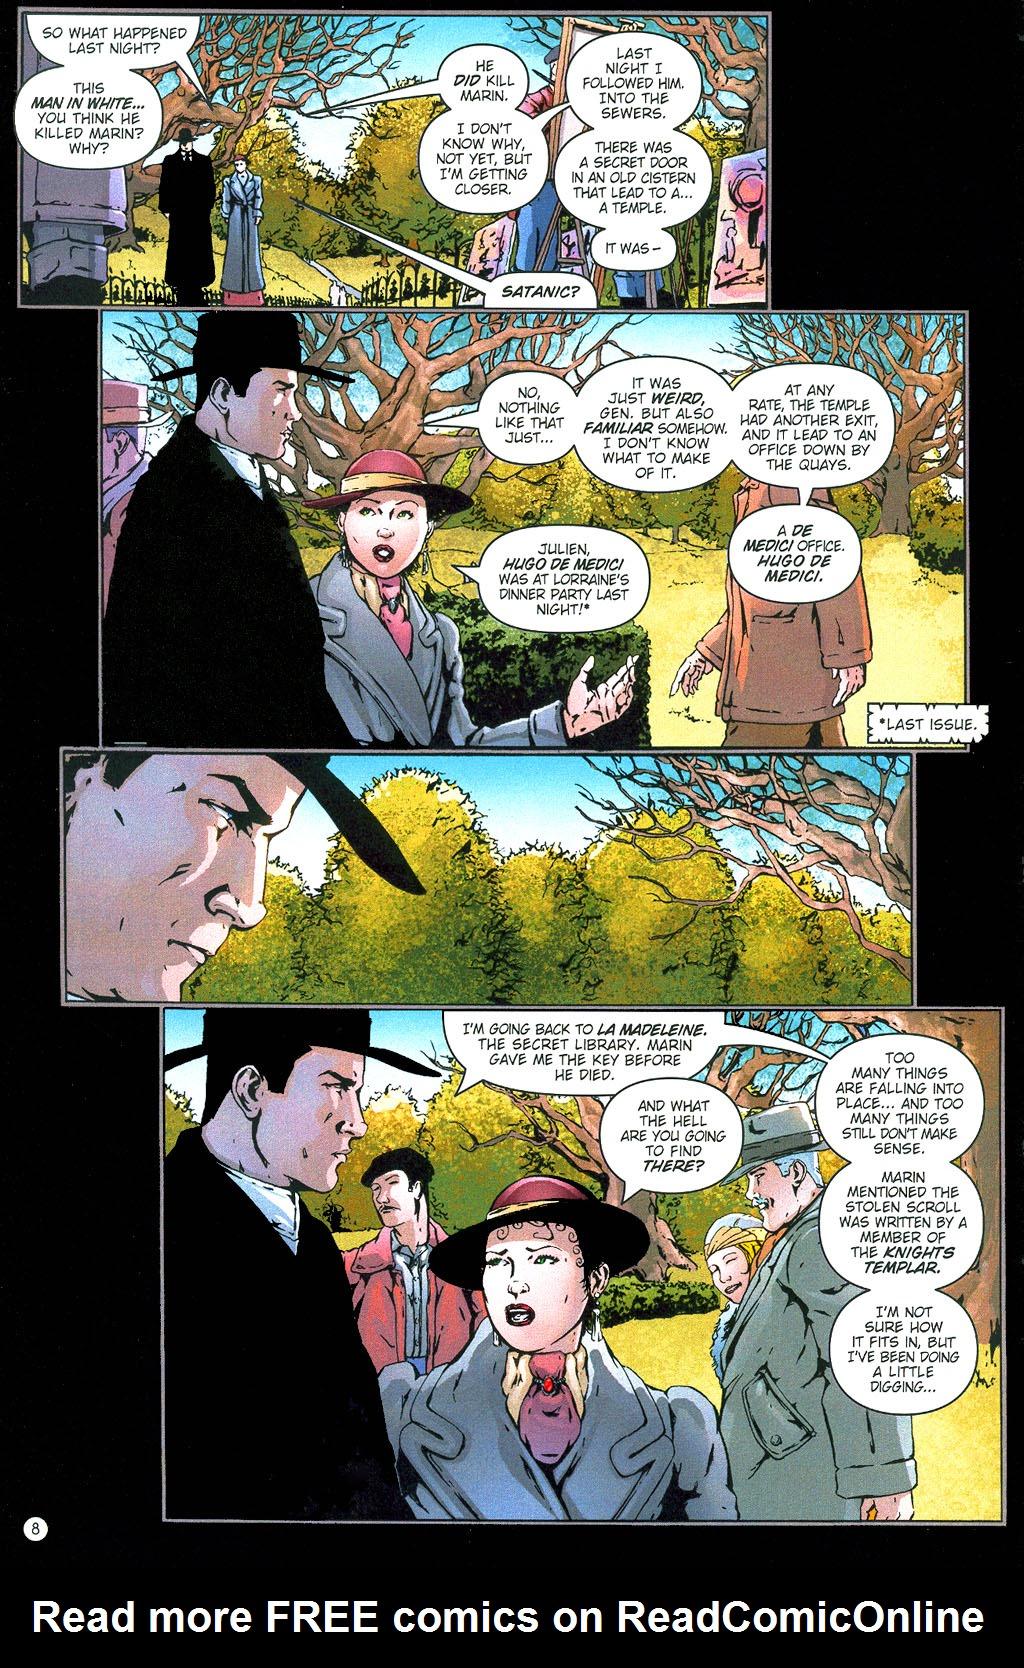 Read online Rex Mundi comic -  Issue #6 - 11